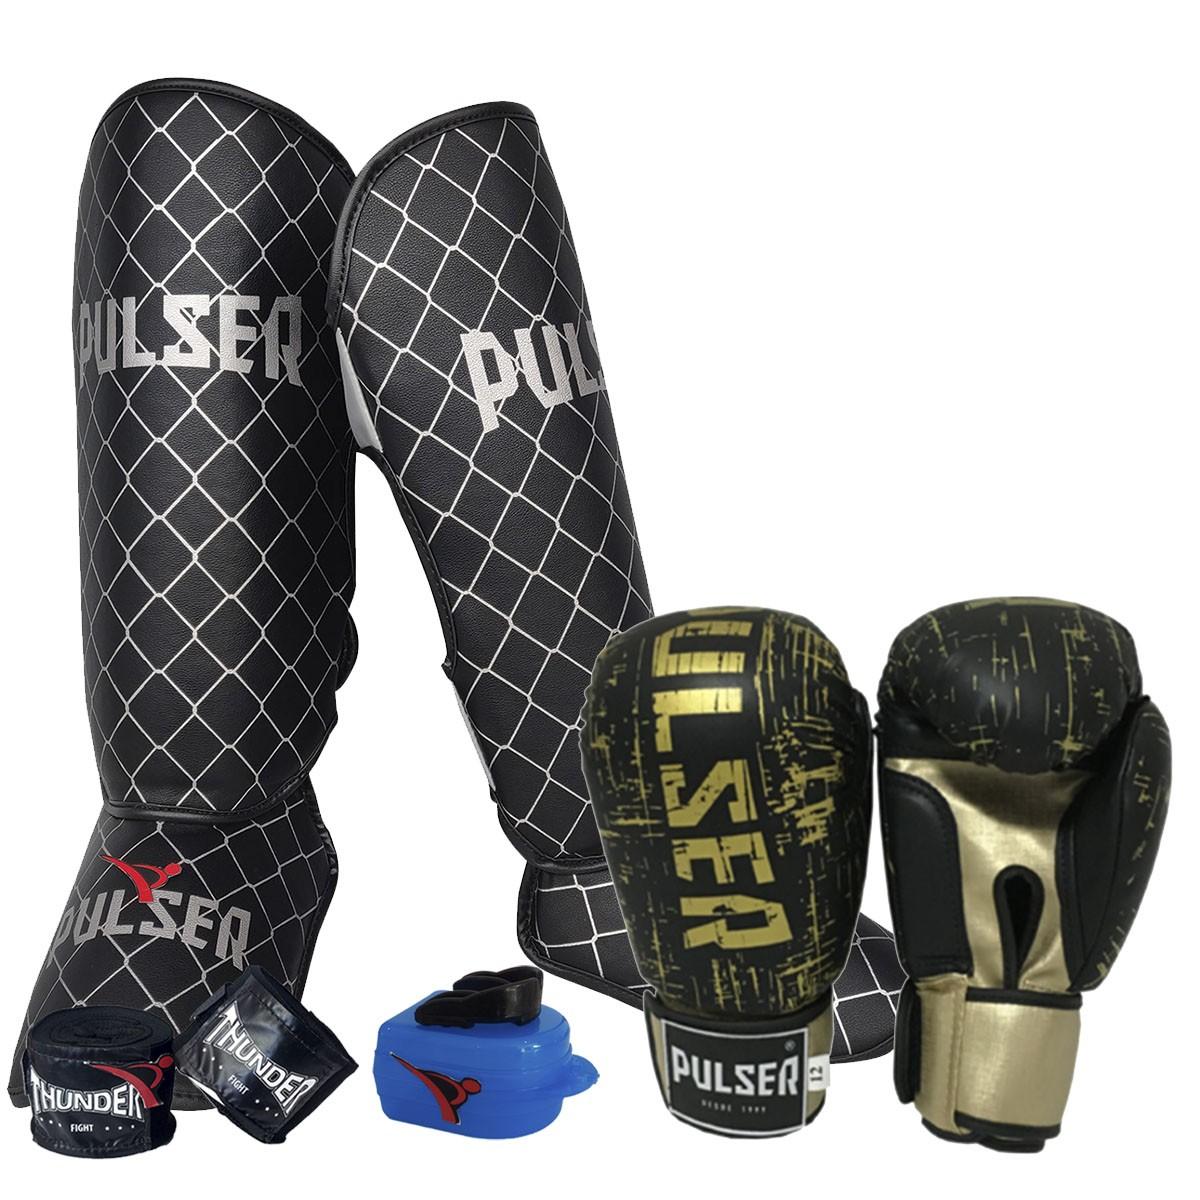 Kit de Muay Thai / Kickboxing 12oz - Preto e Dourado Riscado - Pulser  - PRALUTA SHOP